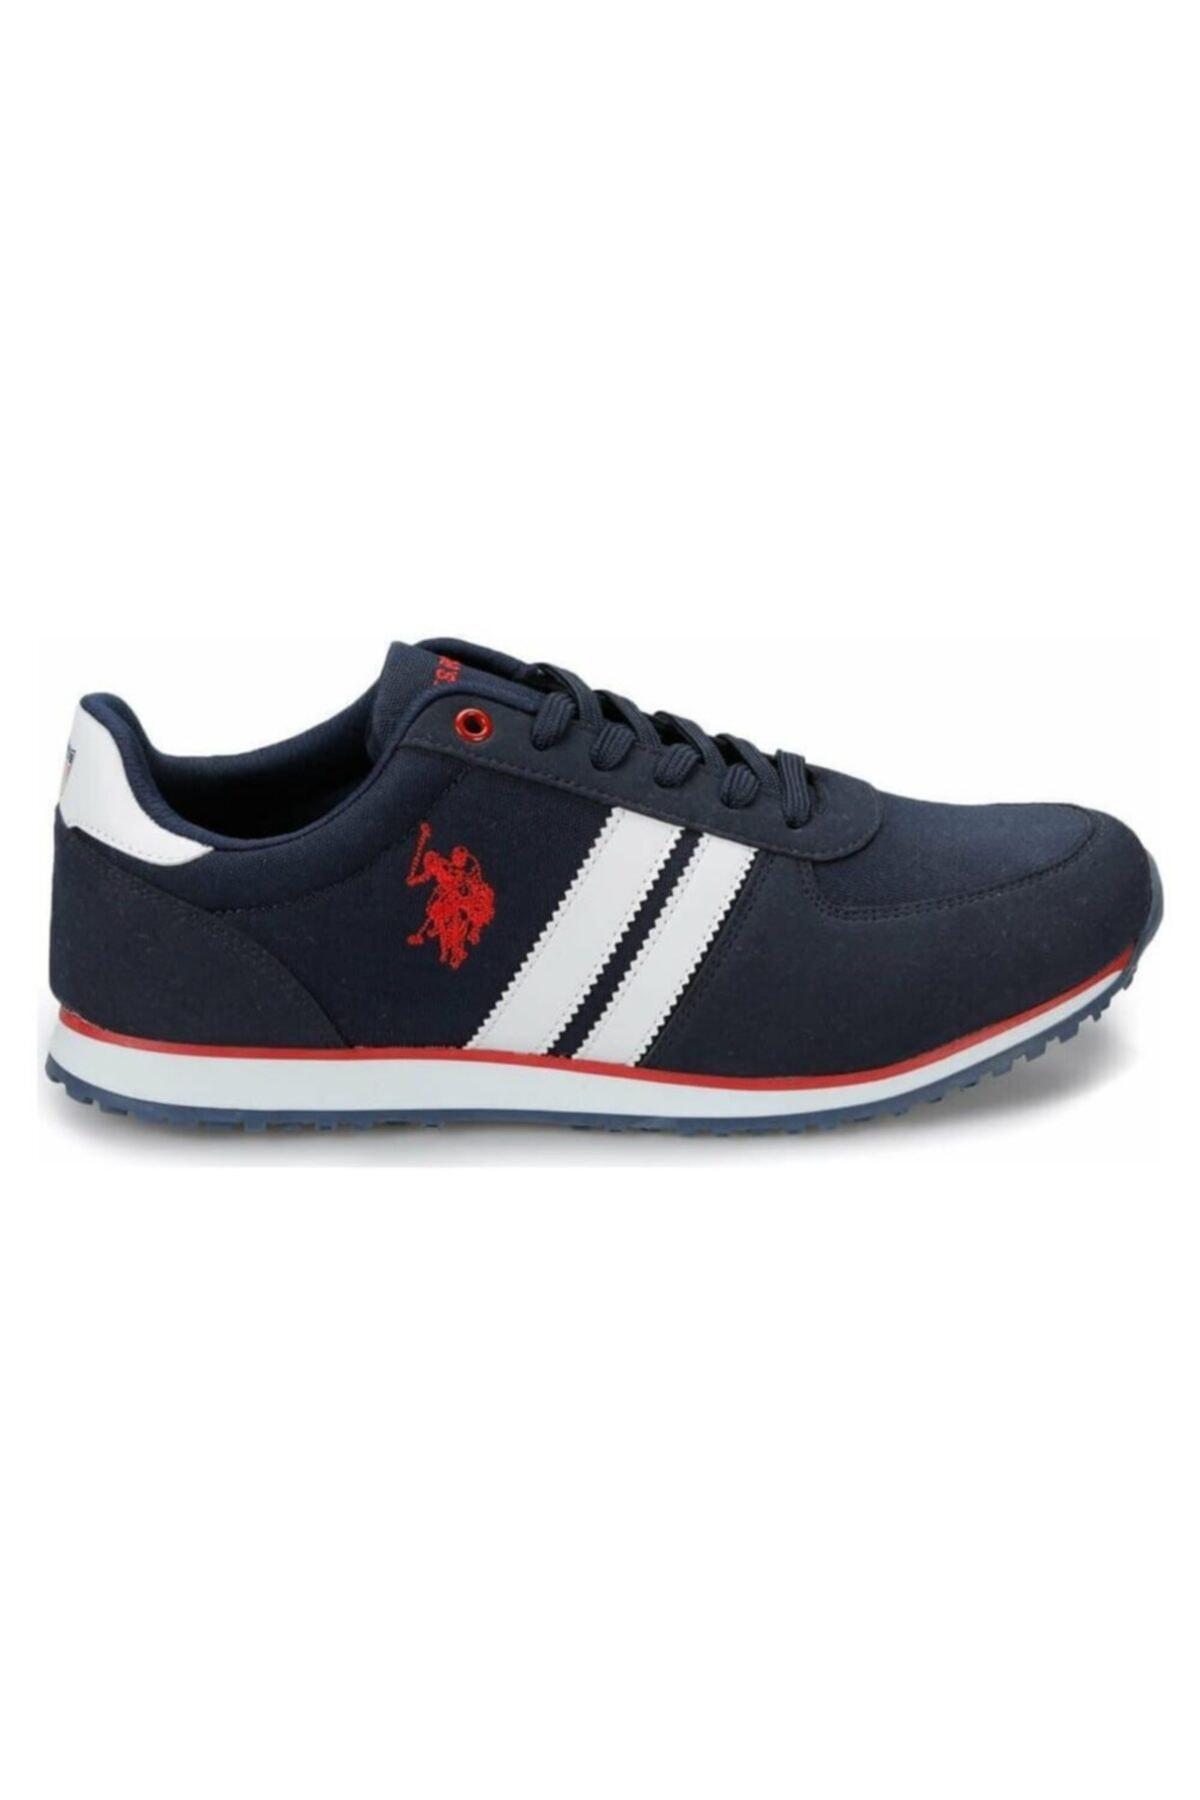 U.S. Polo Assn. PLUS 1FX Lacivert Erkek Sneaker Ayakkabı 100910647 2